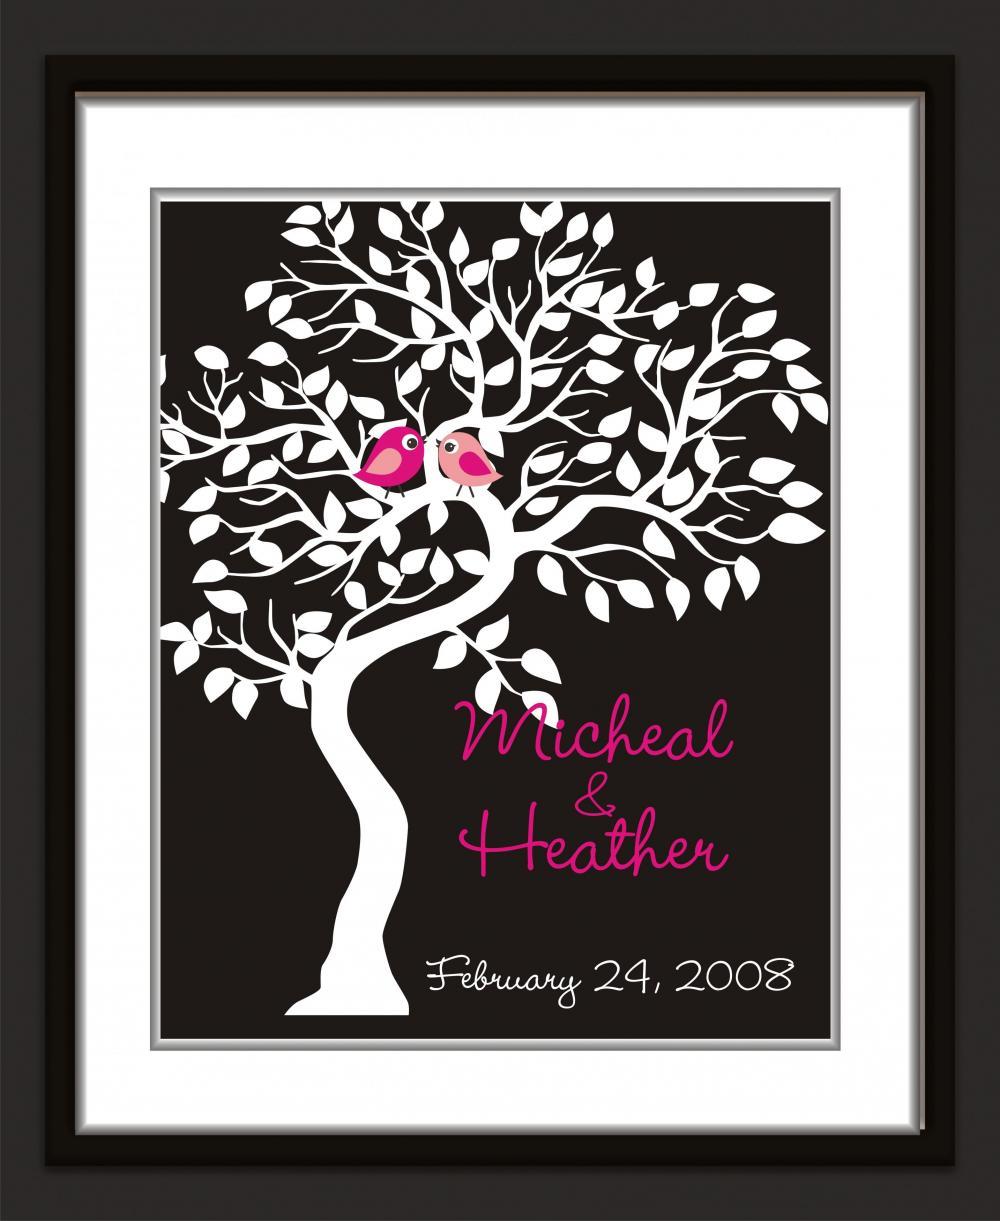 Wedding Guest Signing Tree: Wedding Signature Tree-guest Book Alternative 18x24 100